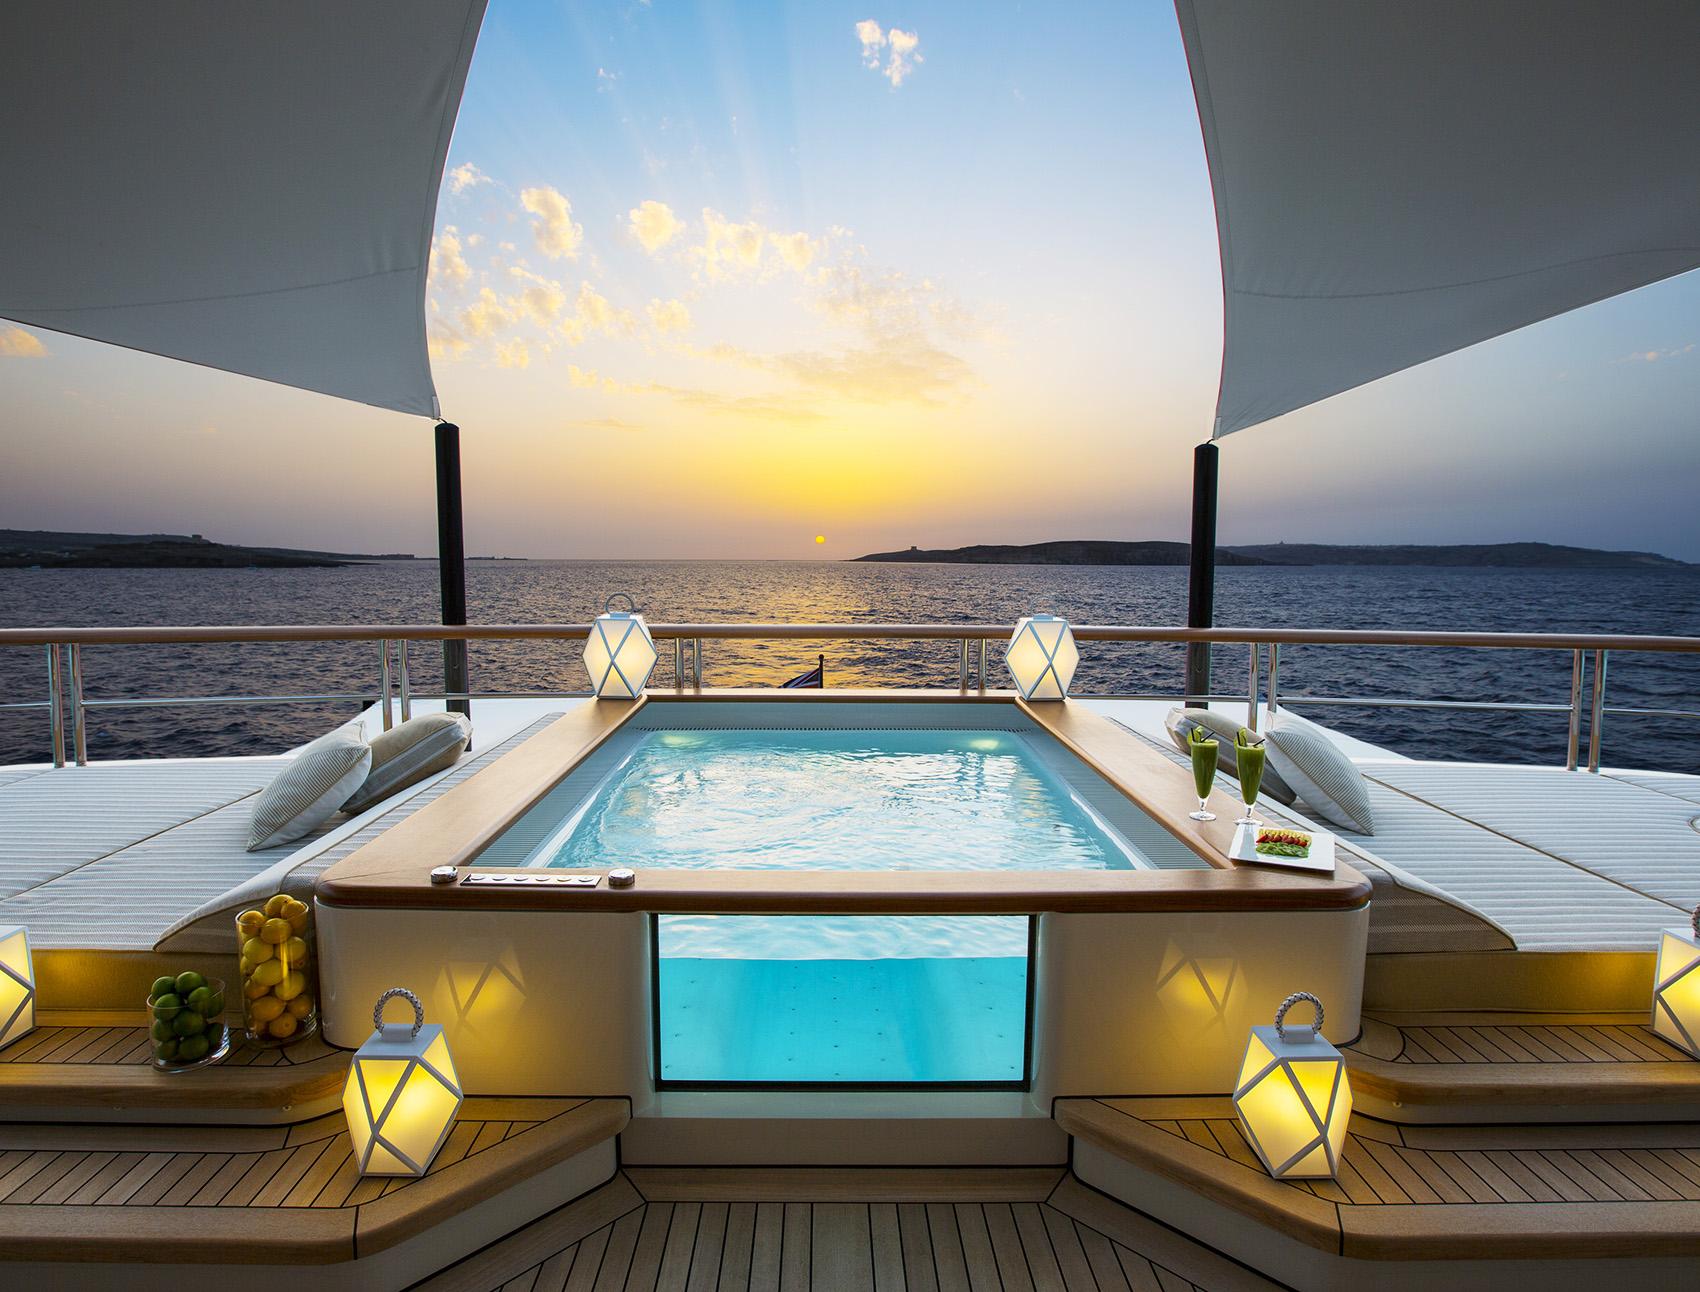 Copyright © www.Yacht-Shot.com